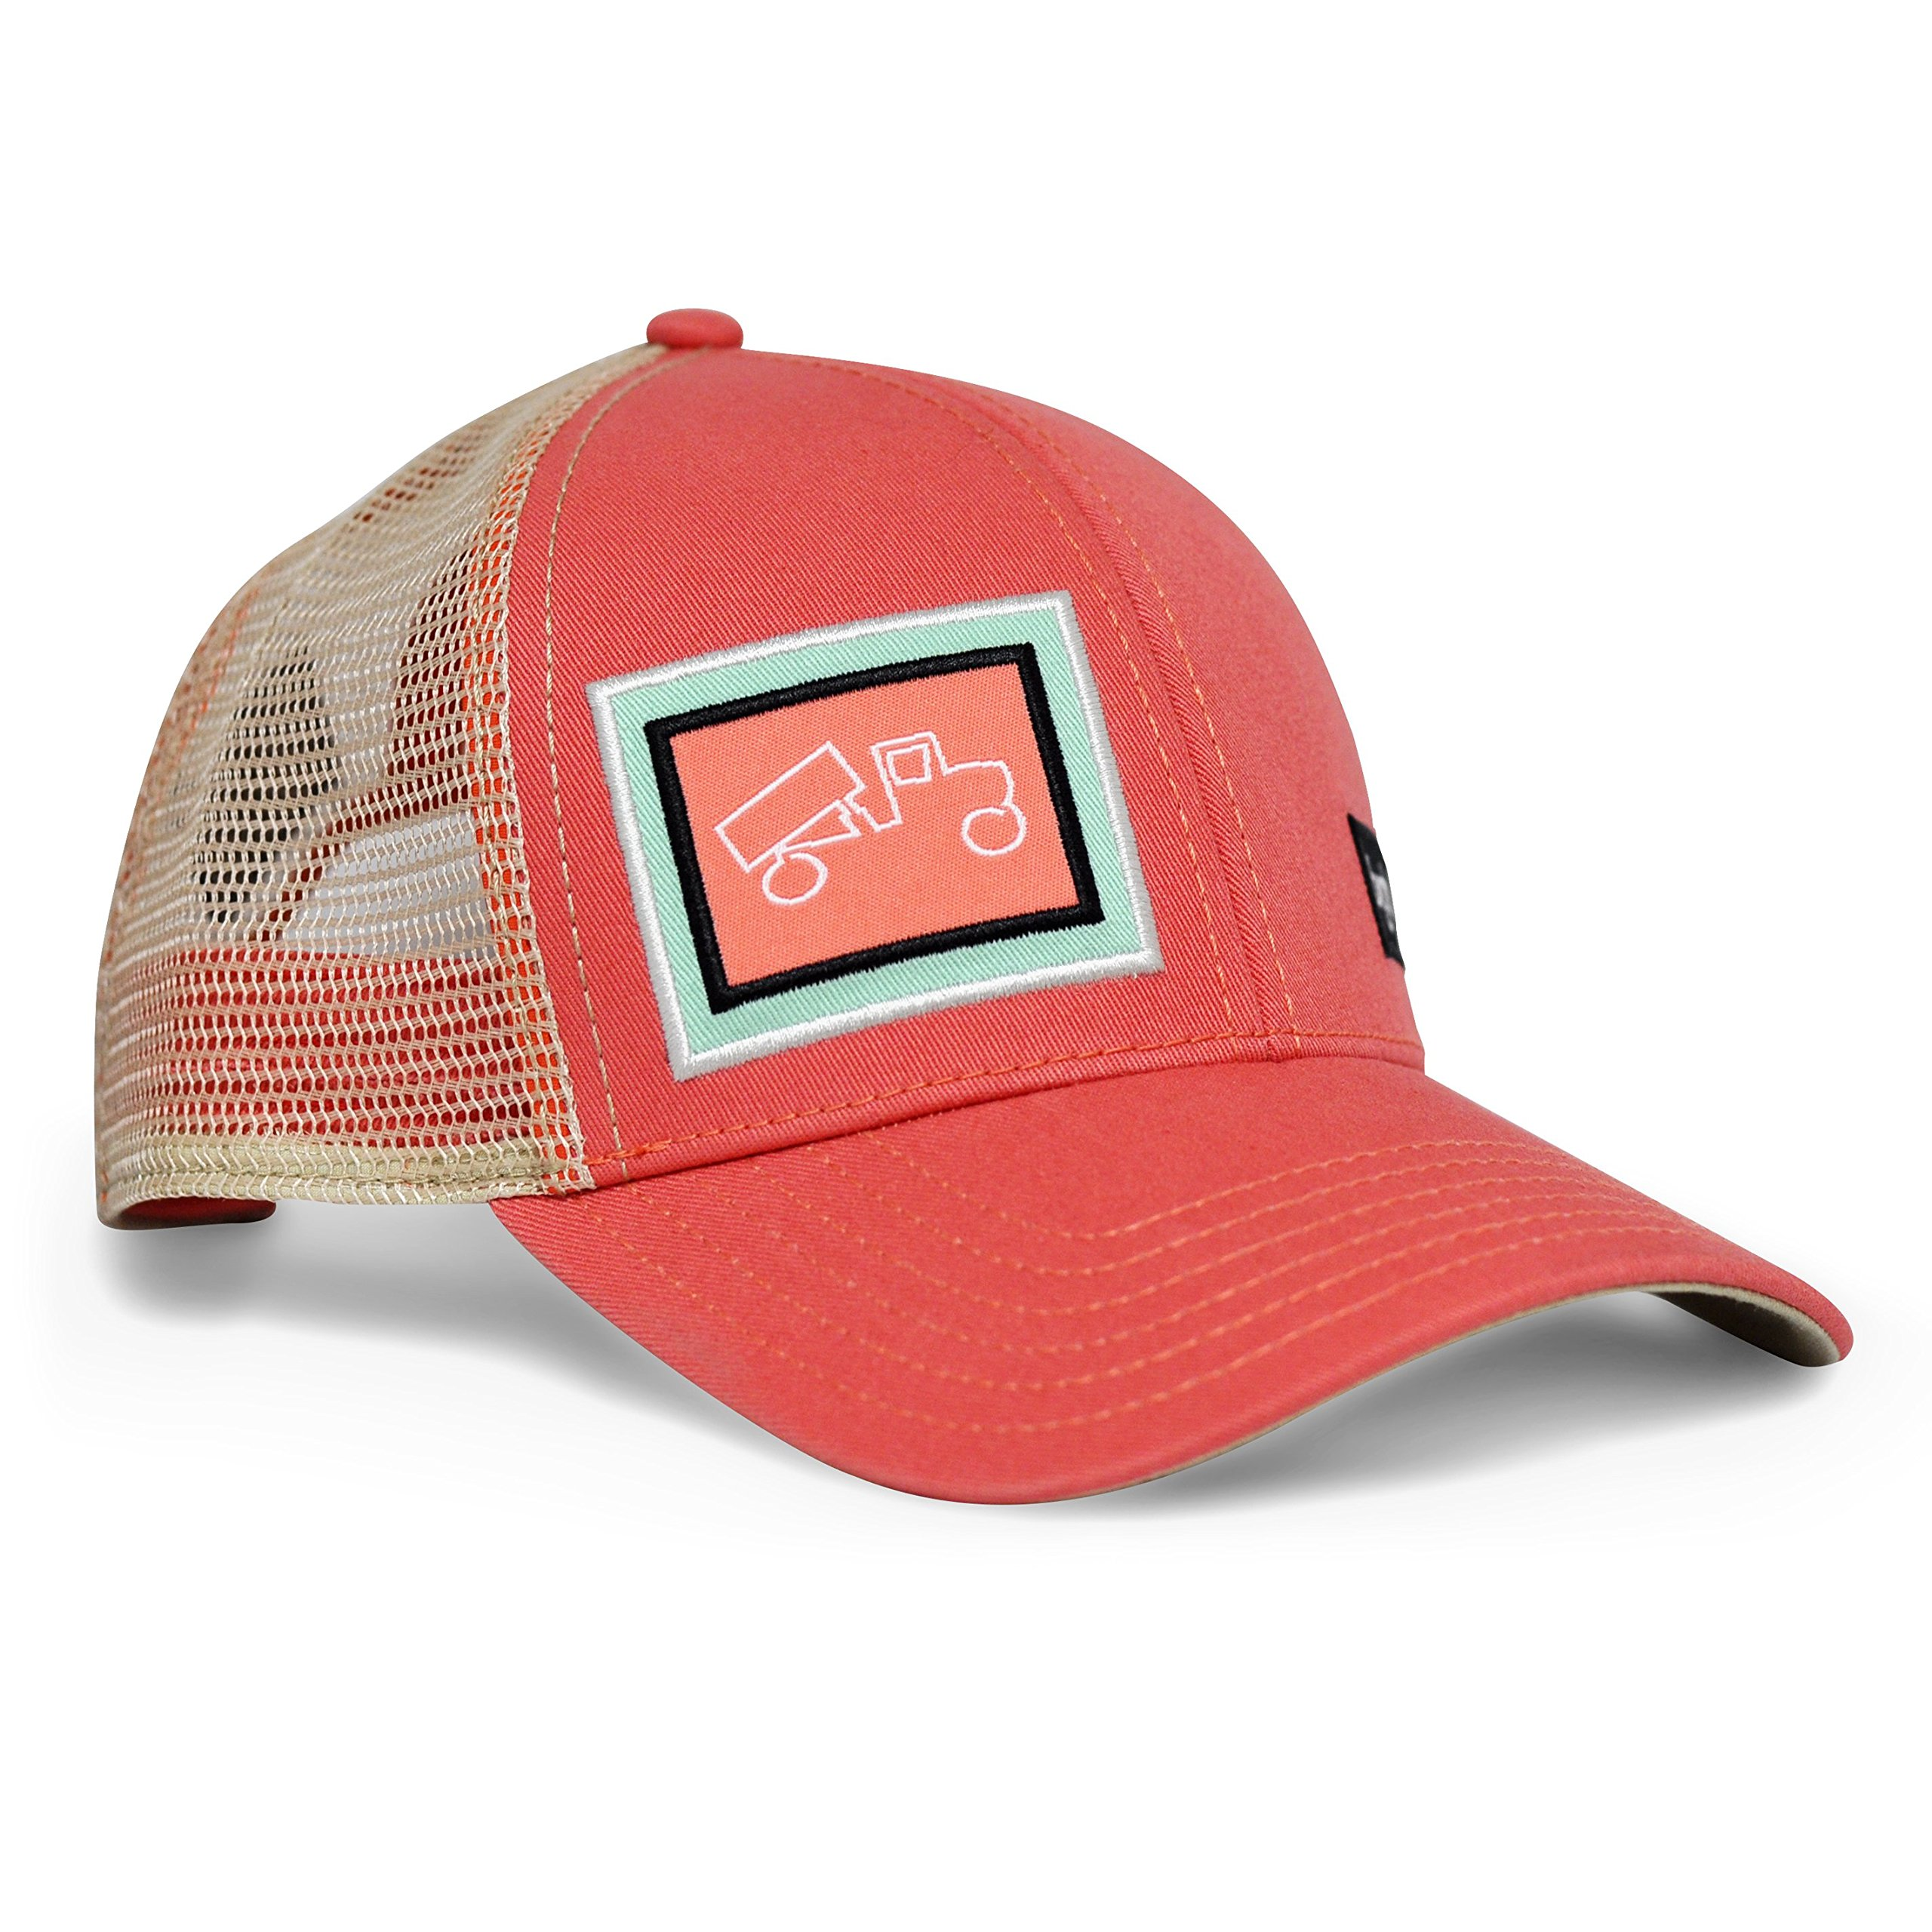 bigtruck Classic Trucker Hat, Salmon Khaki, Adult